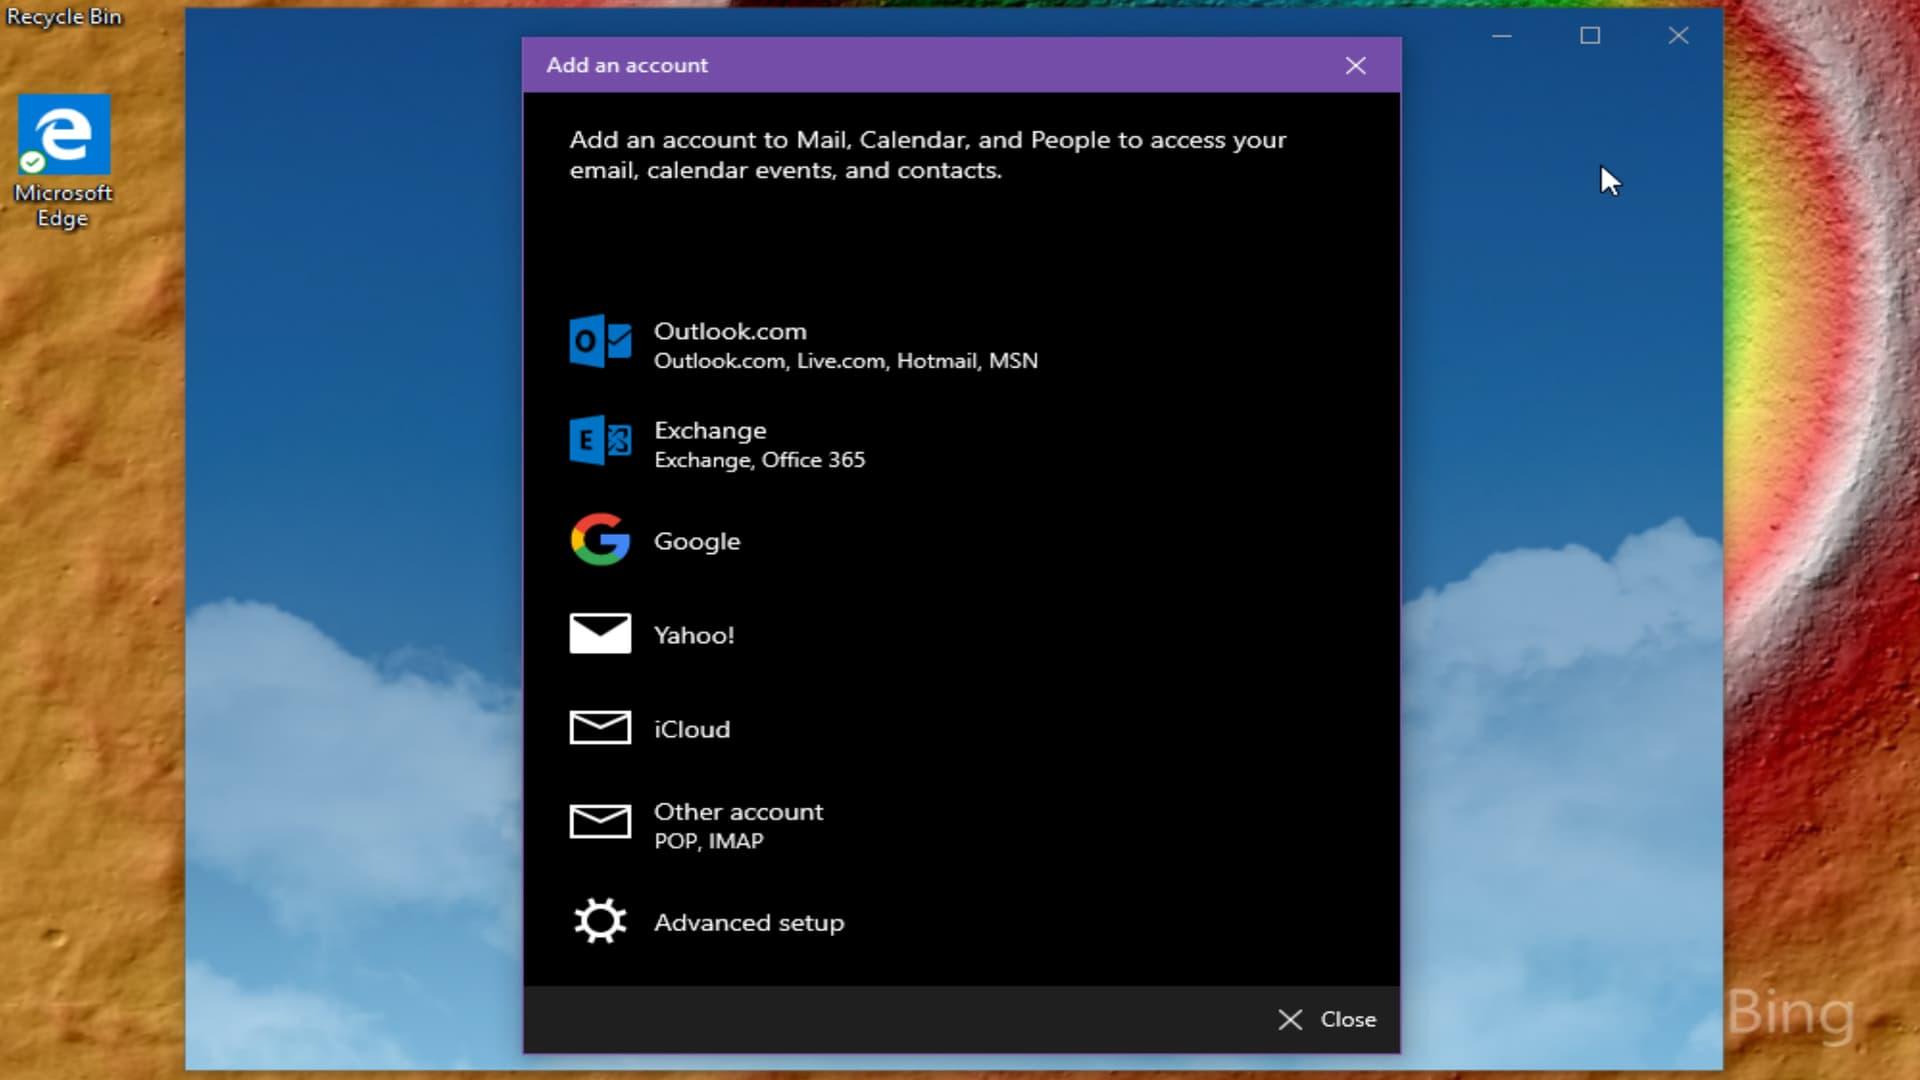 Windows 10 Mail Add Account